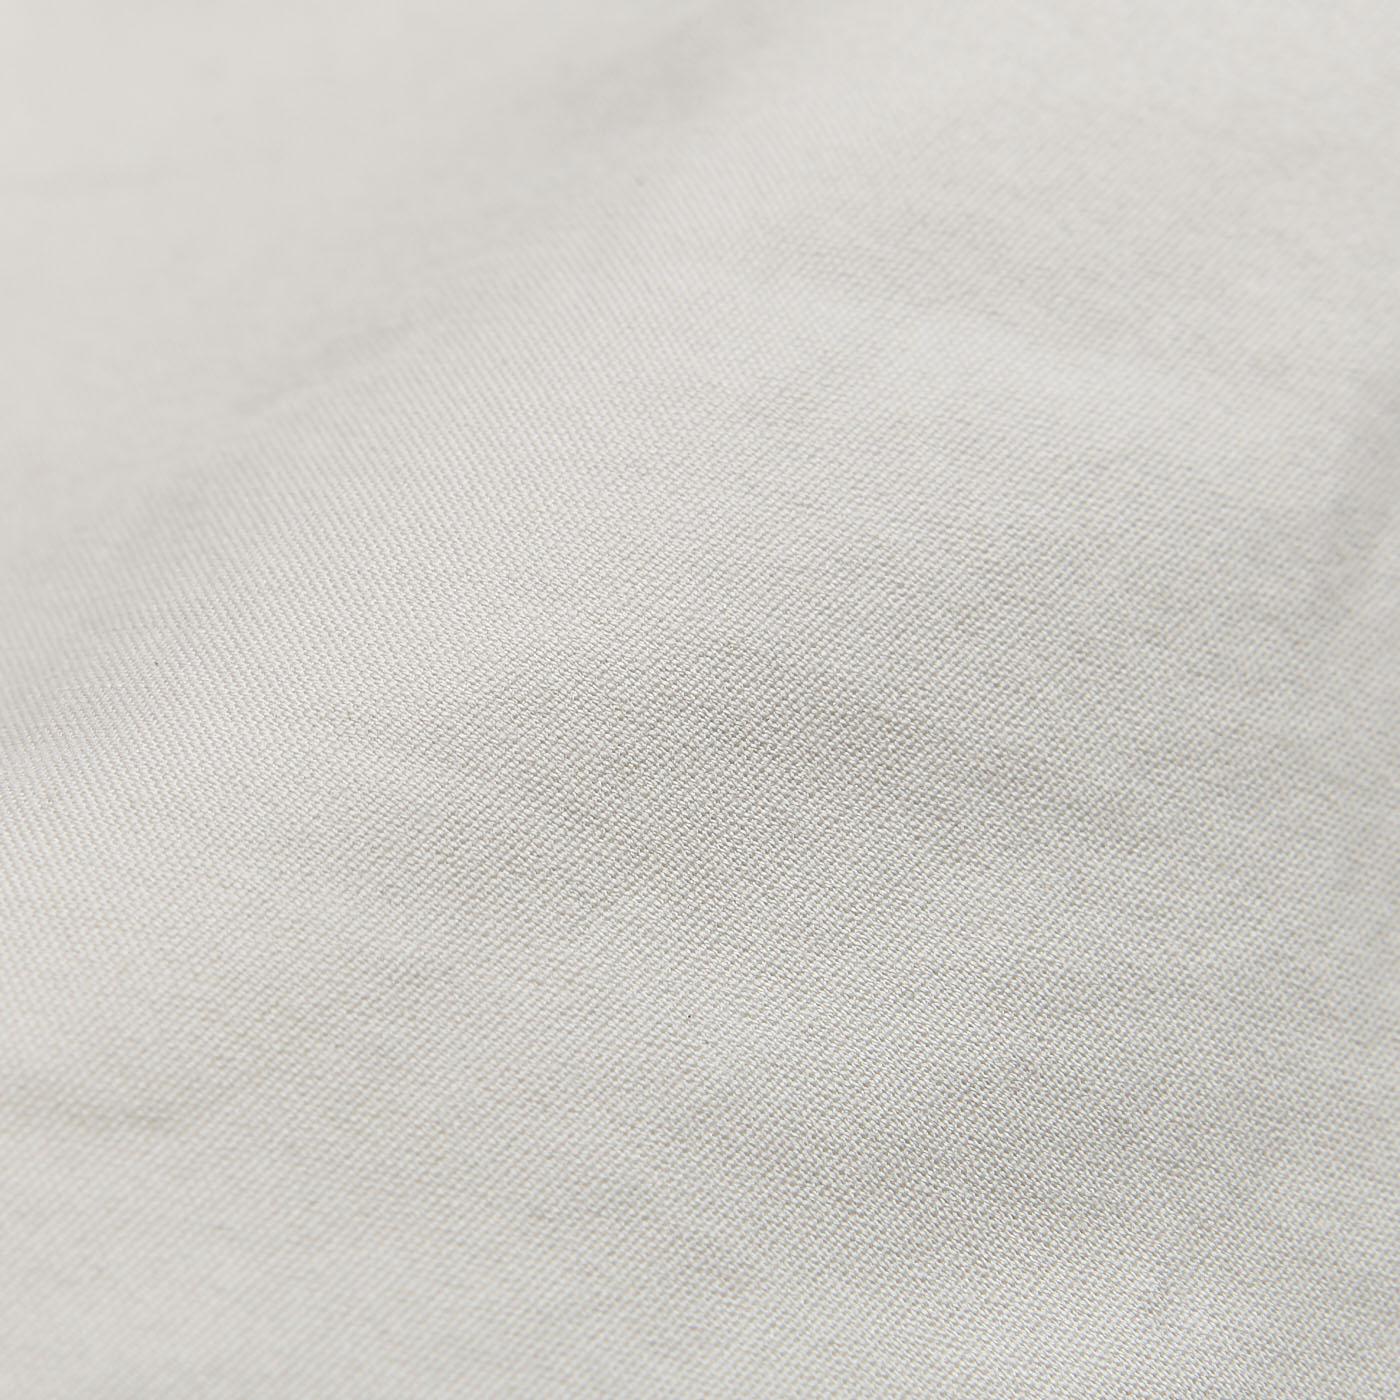 Hiltl Beige Cotton Nylon Traveller Slim Shorts Fabric